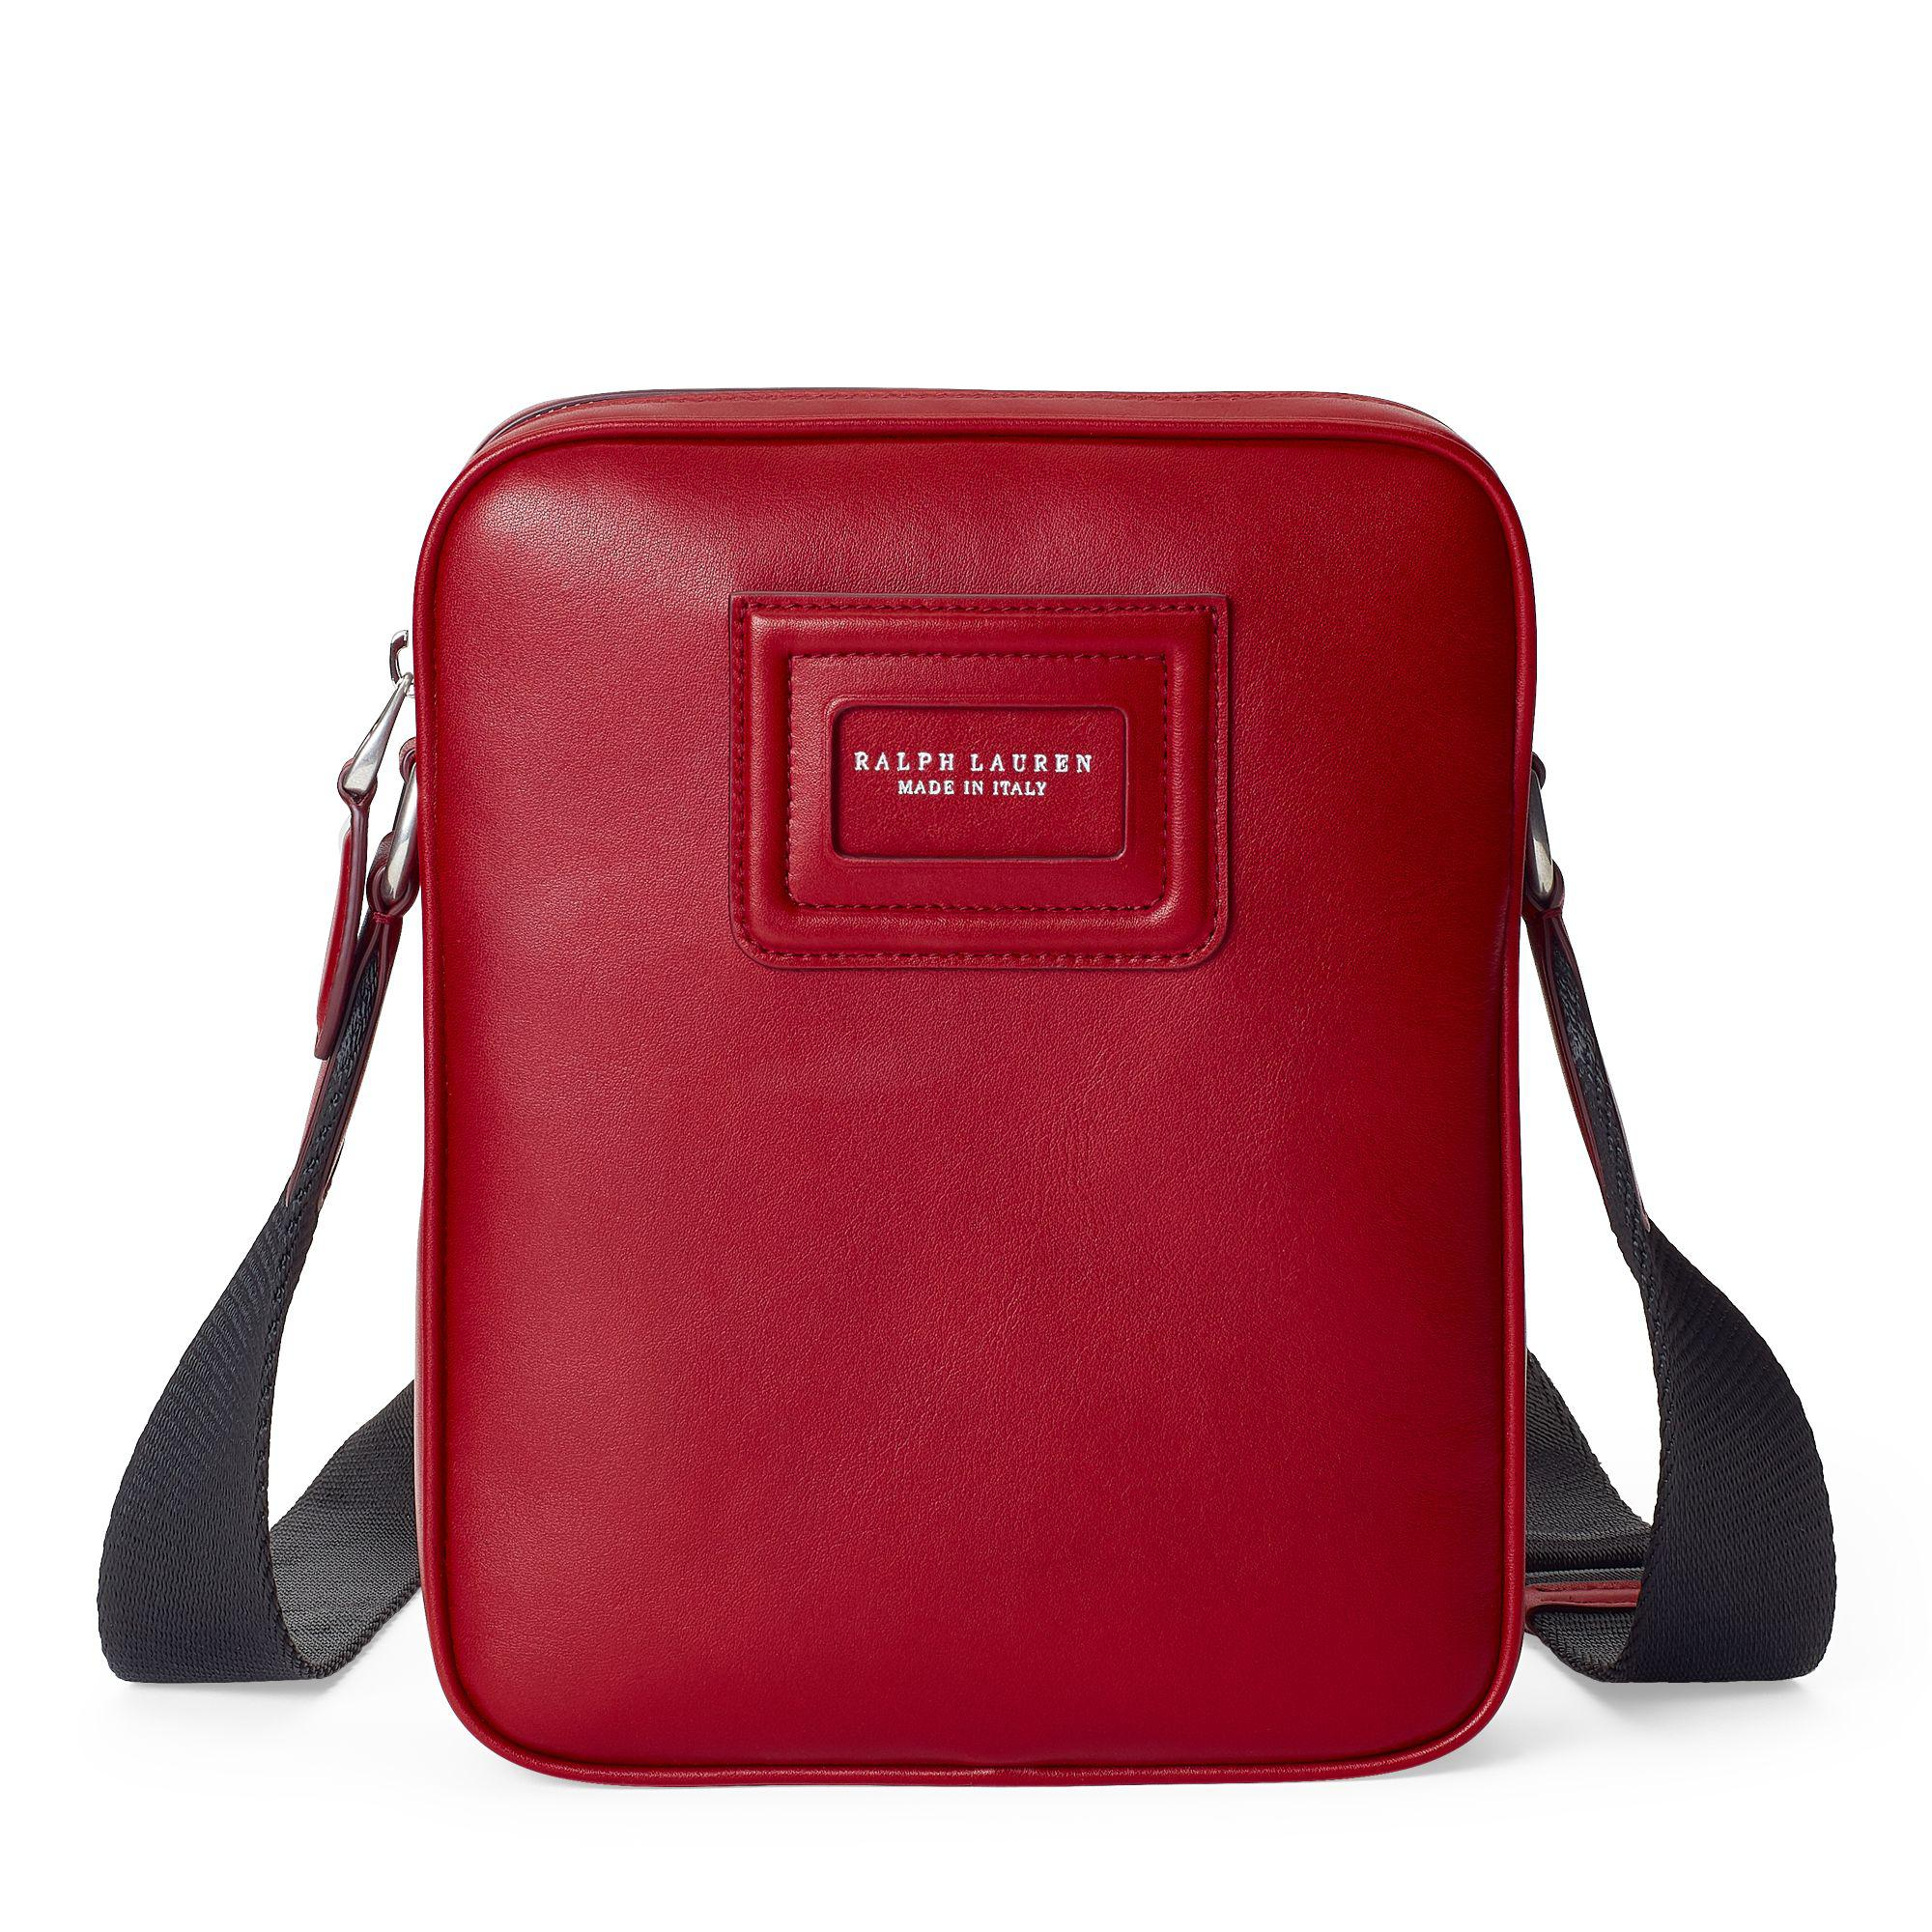 230c10bf59c1 Ralph Lauren Id Badge Leather Crossbody Bag in Red for Men - Lyst